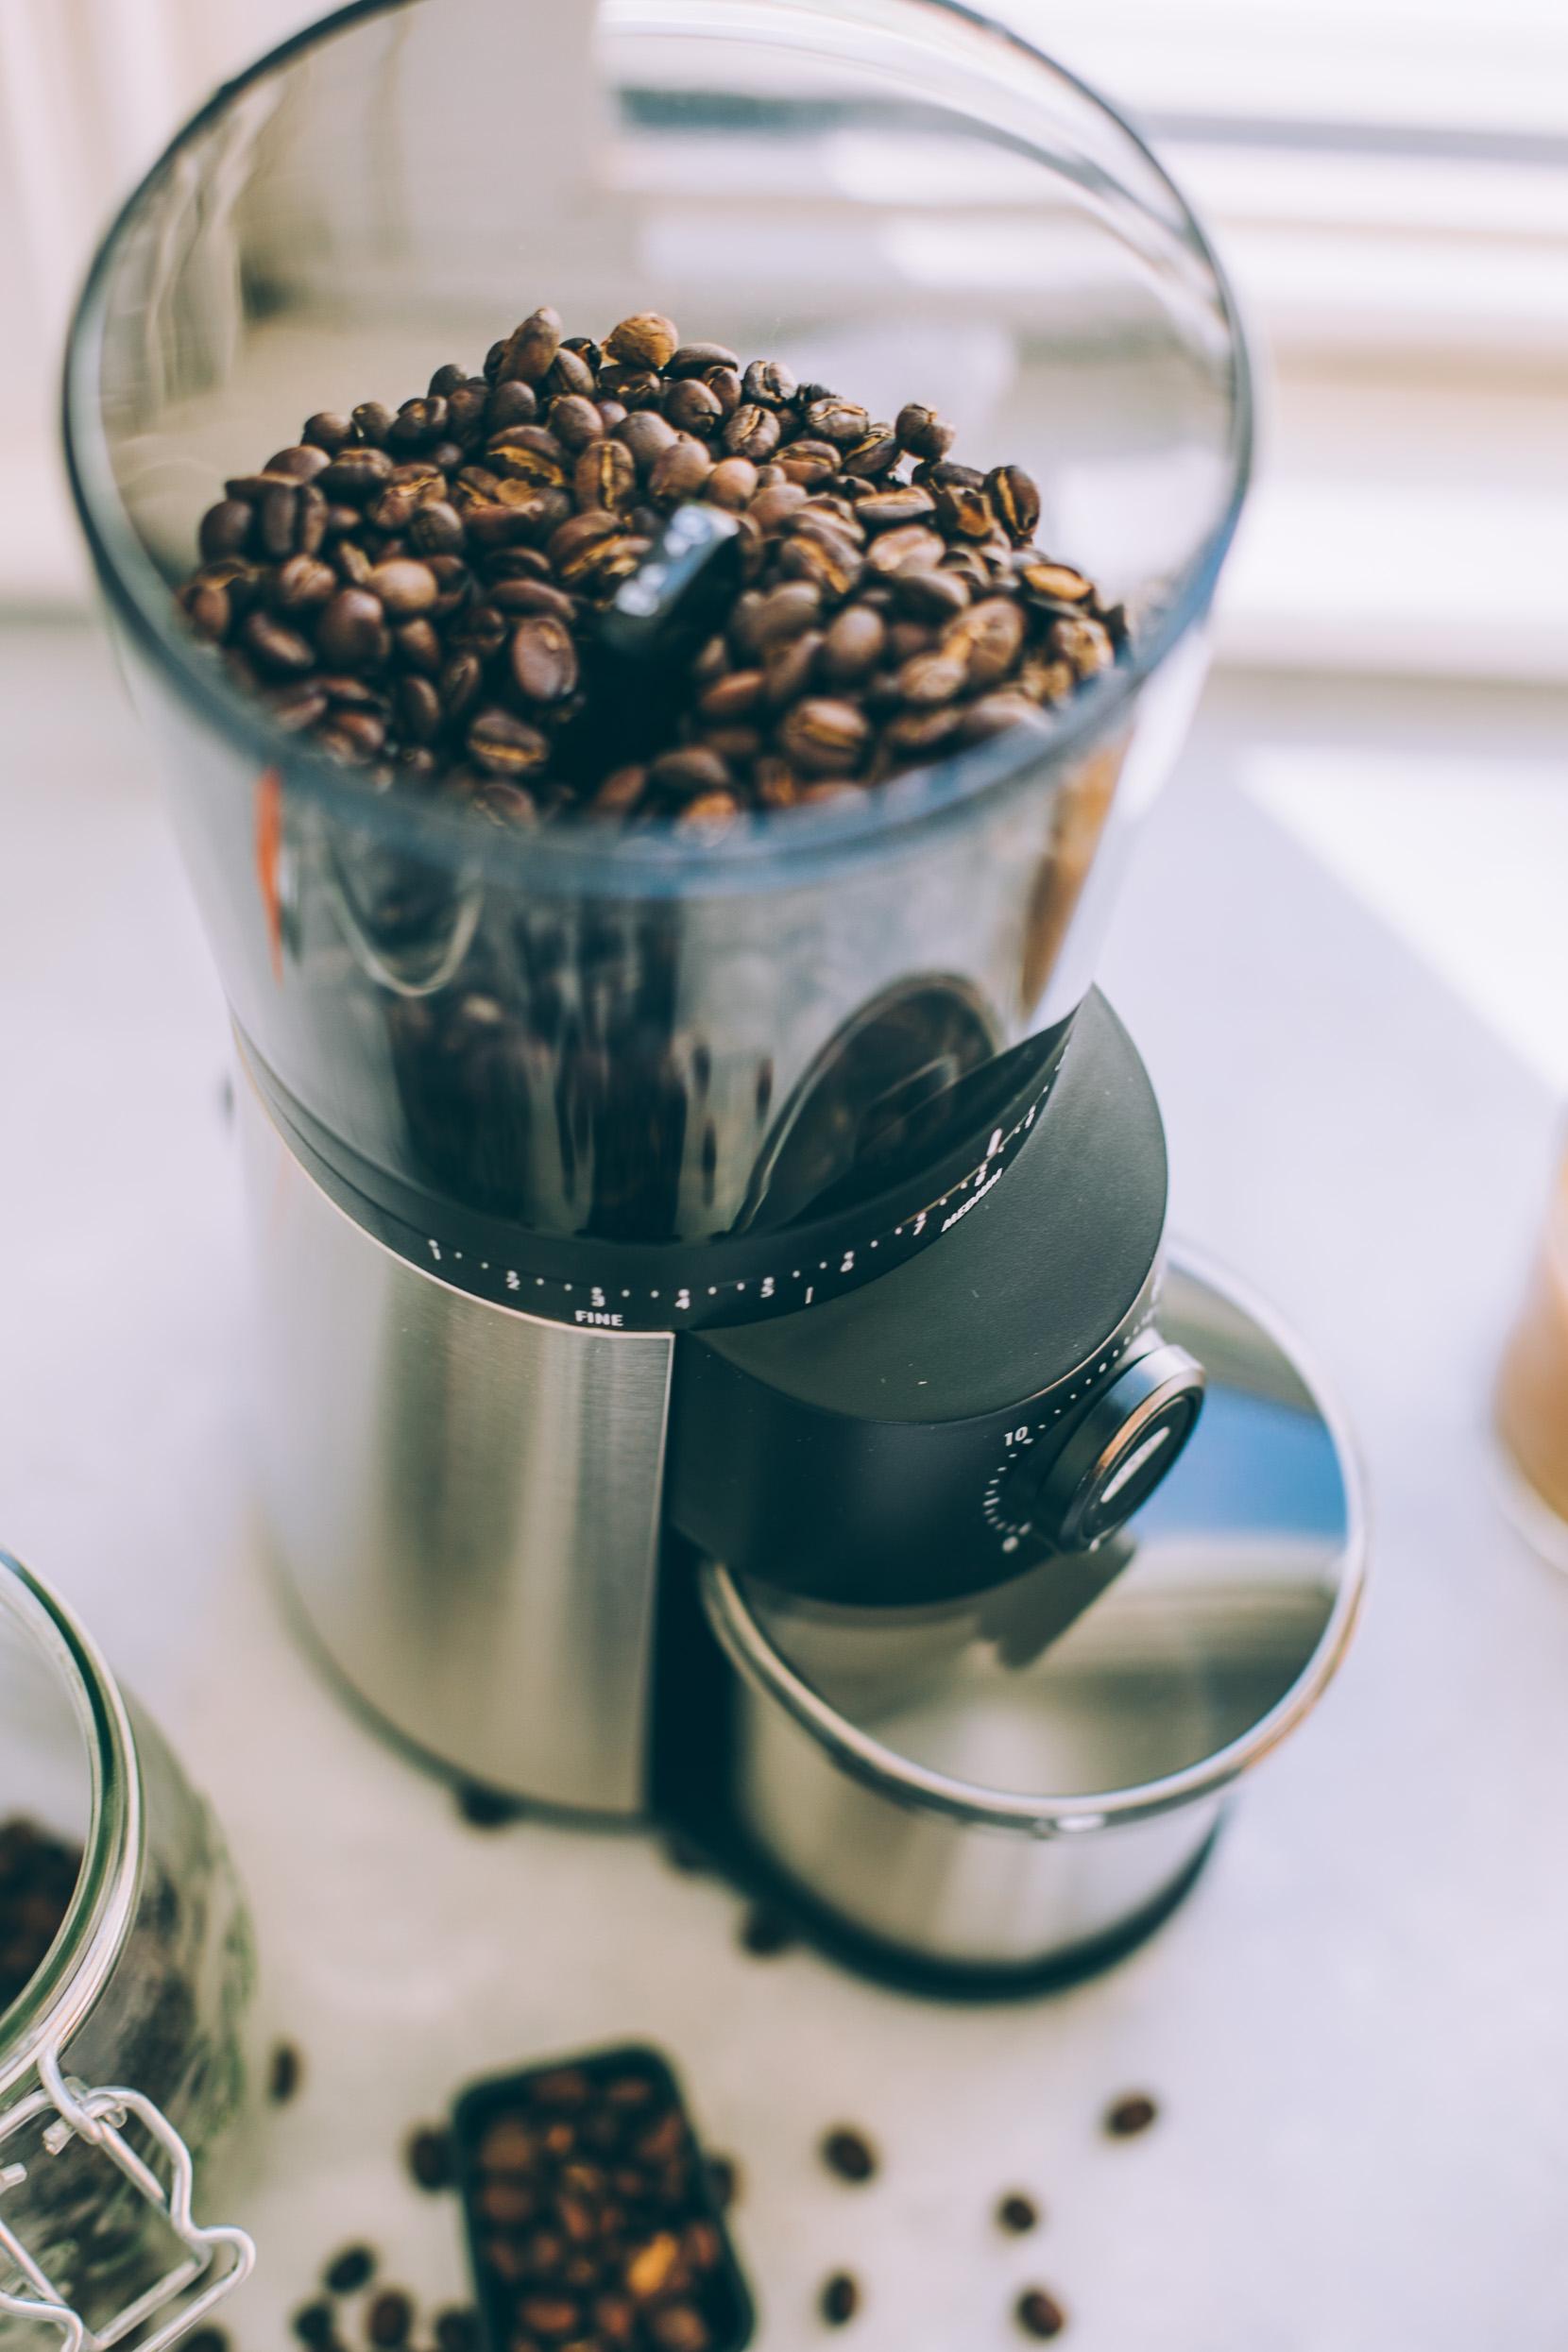 oxo-coffee-french-press-7438.jpg